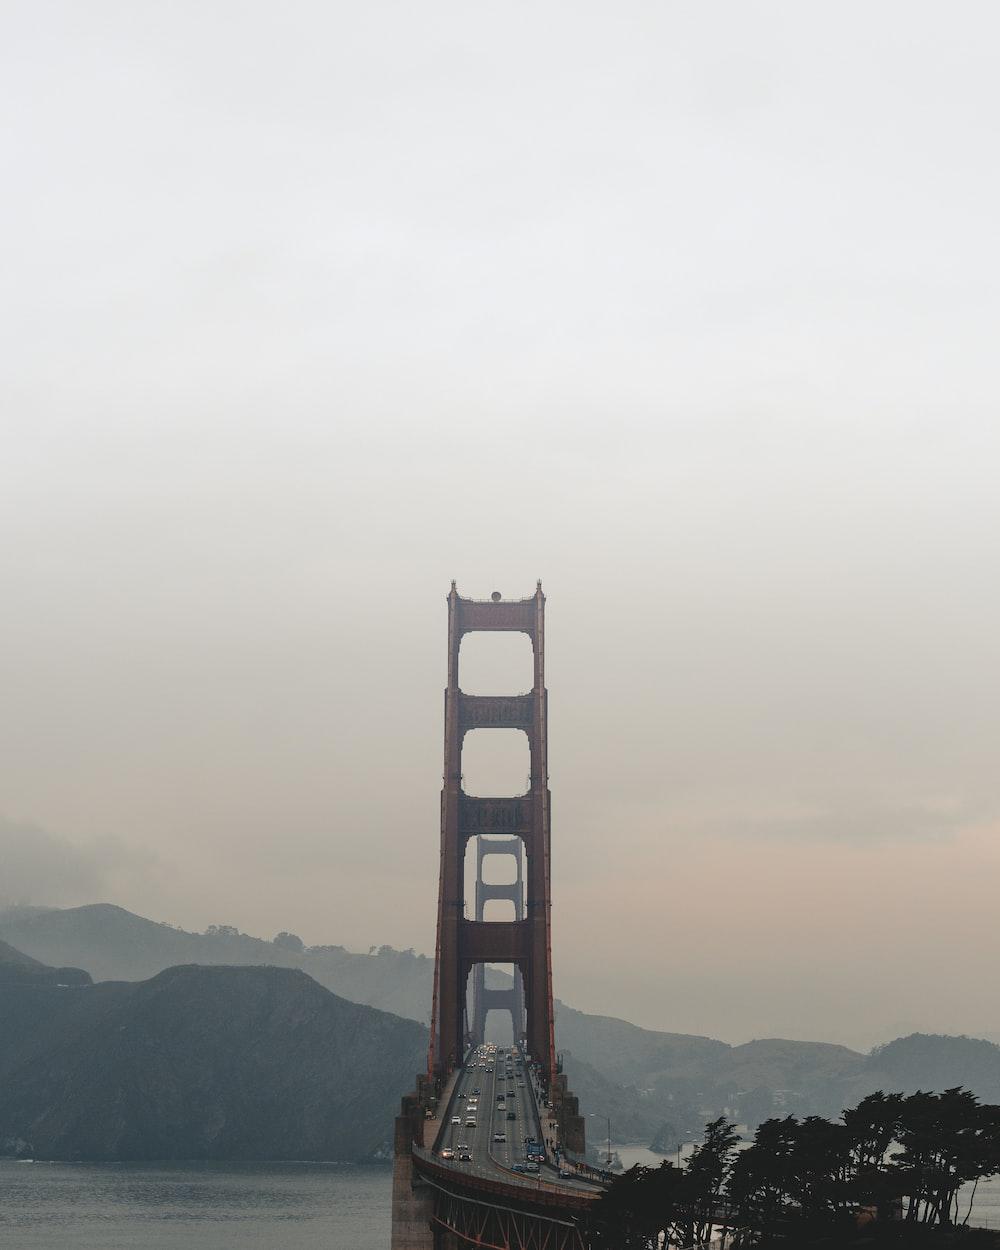 brown gate bridge near hills and trees